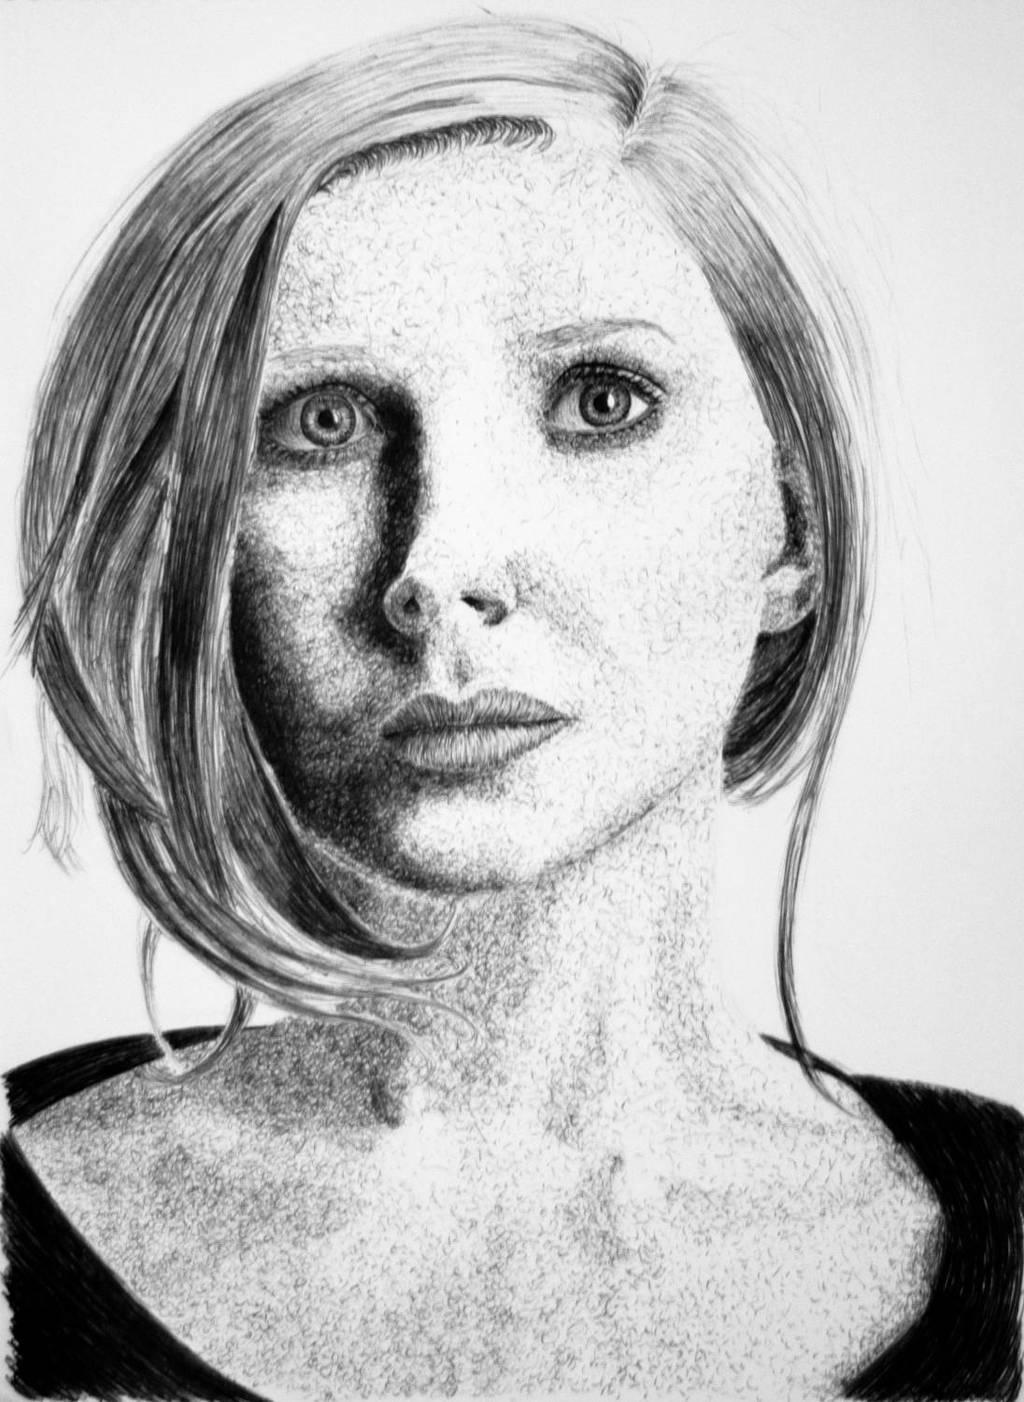 Biro portrait by Samtheengineer